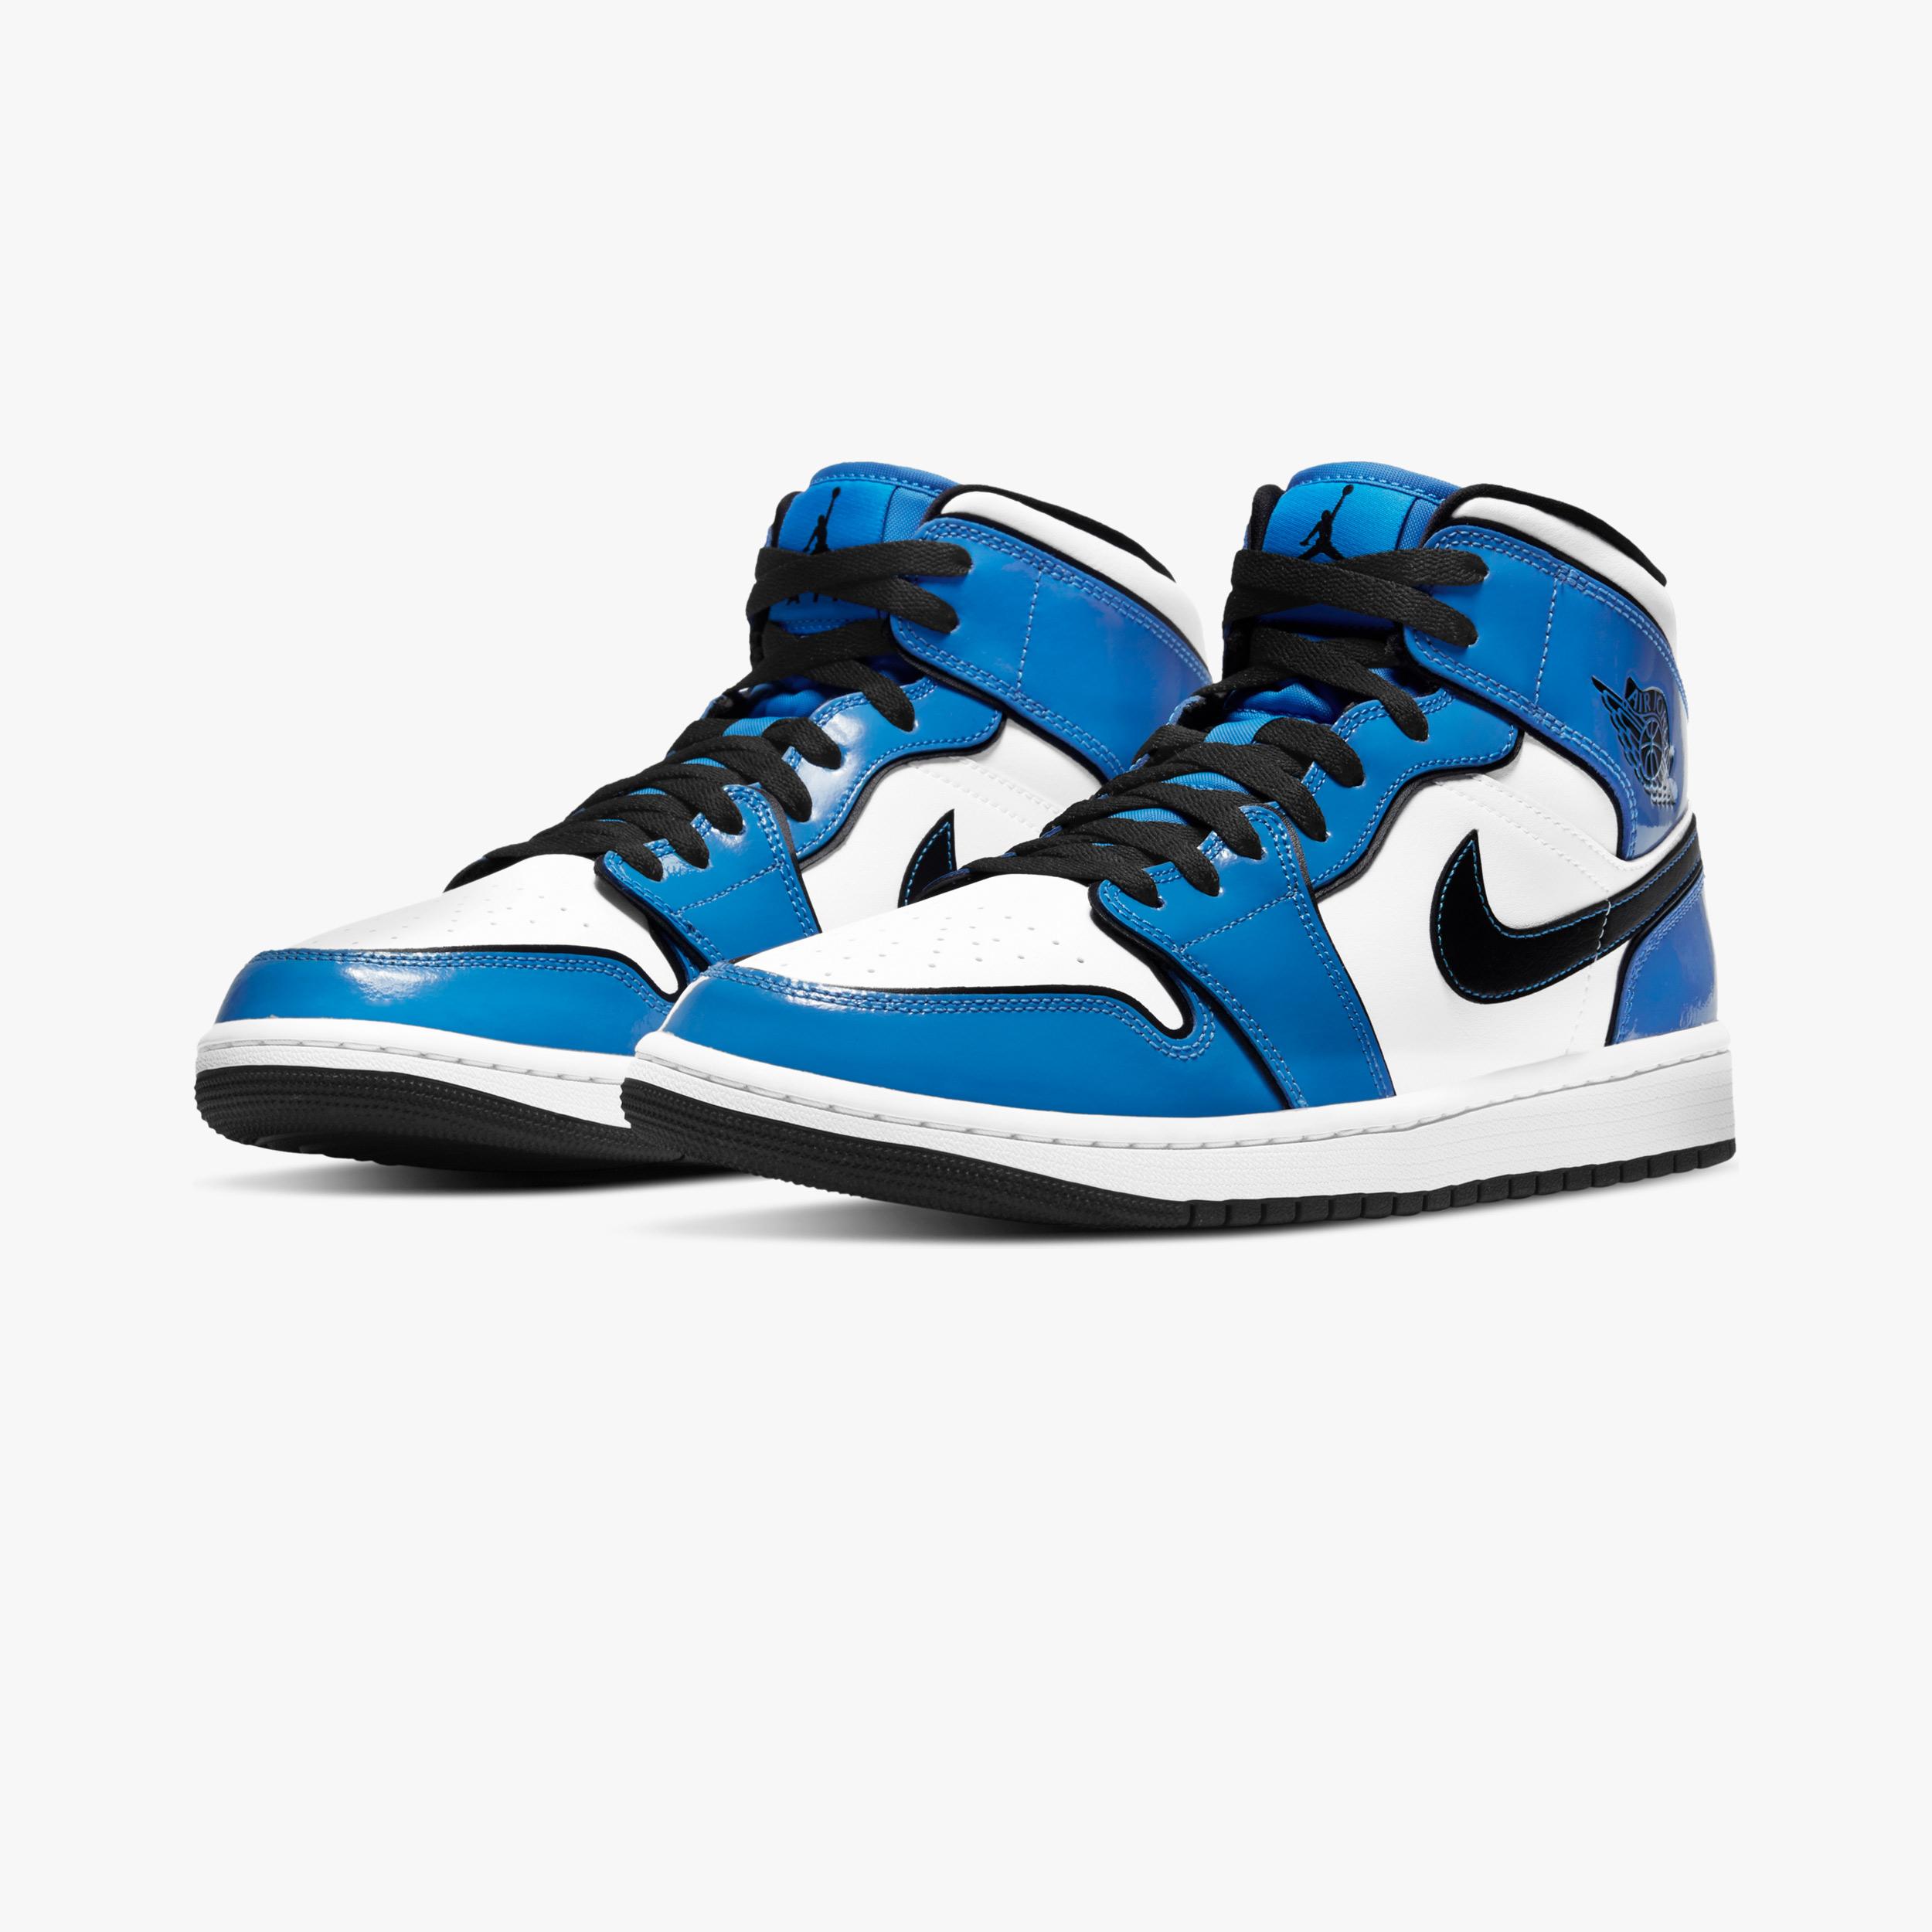 Jordan Brand Air Jordan 1 Mid Se - Dd6834-402 - SNS   sneakers ...